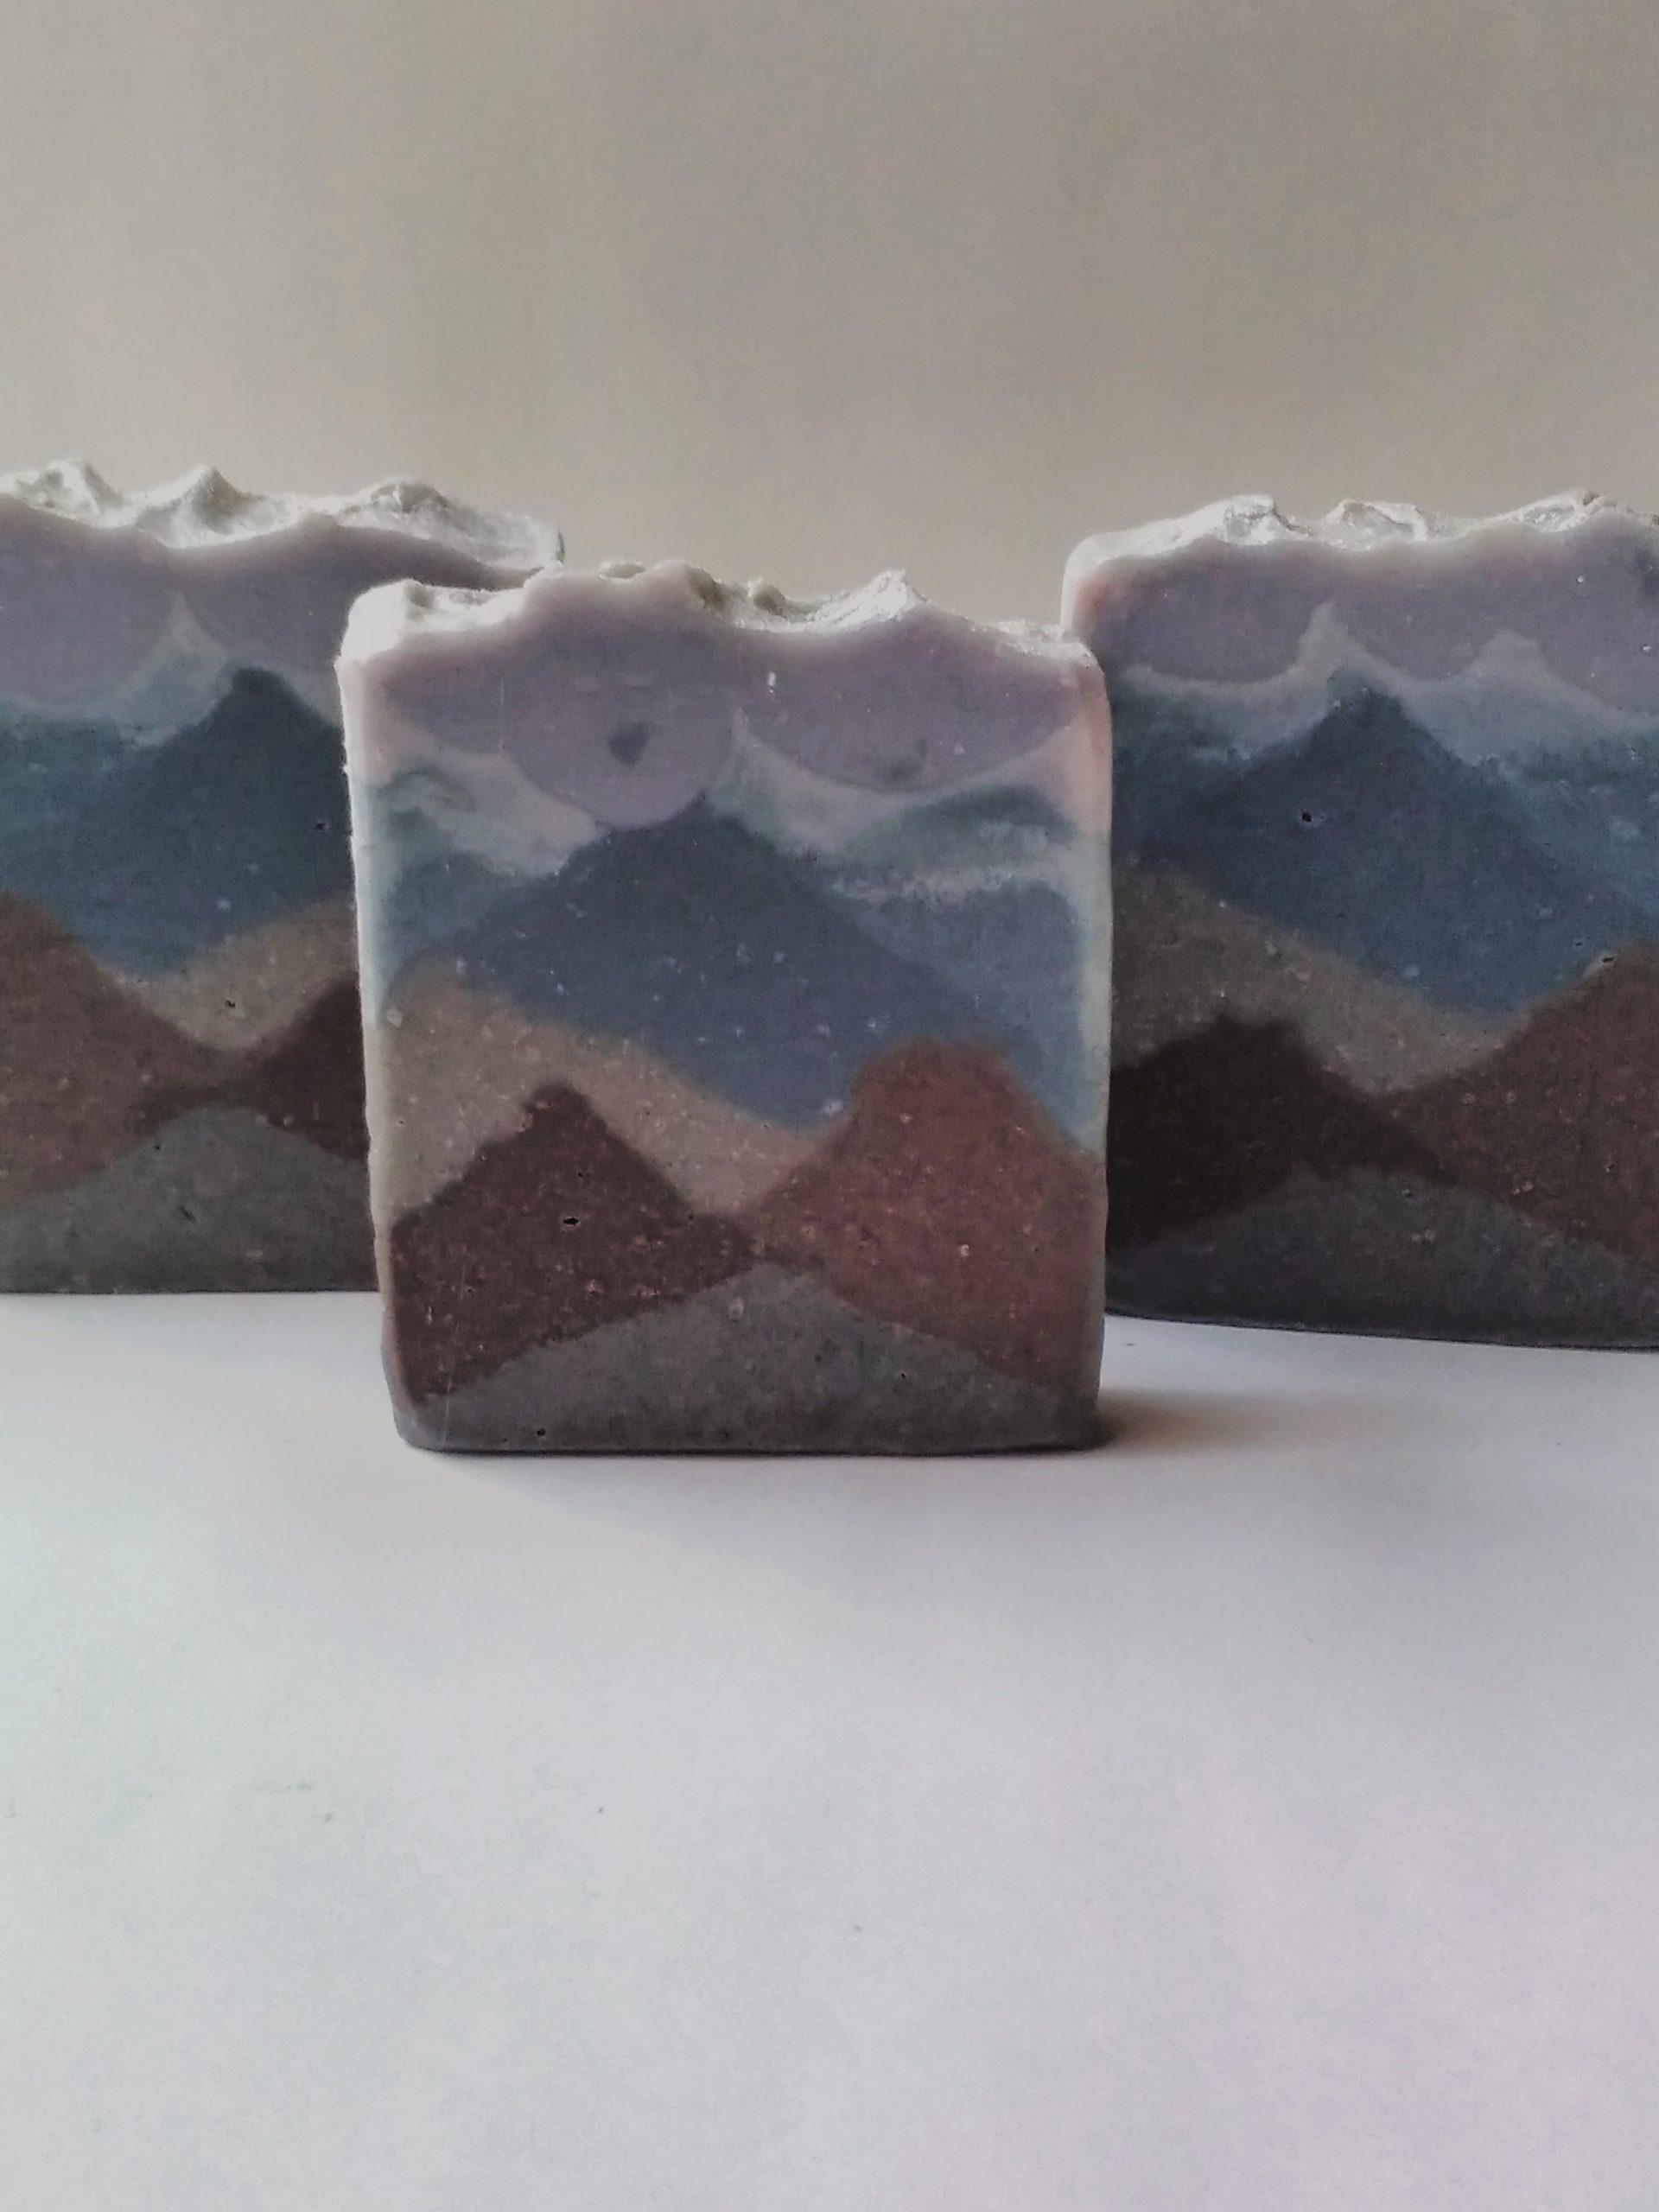 majestic mountains